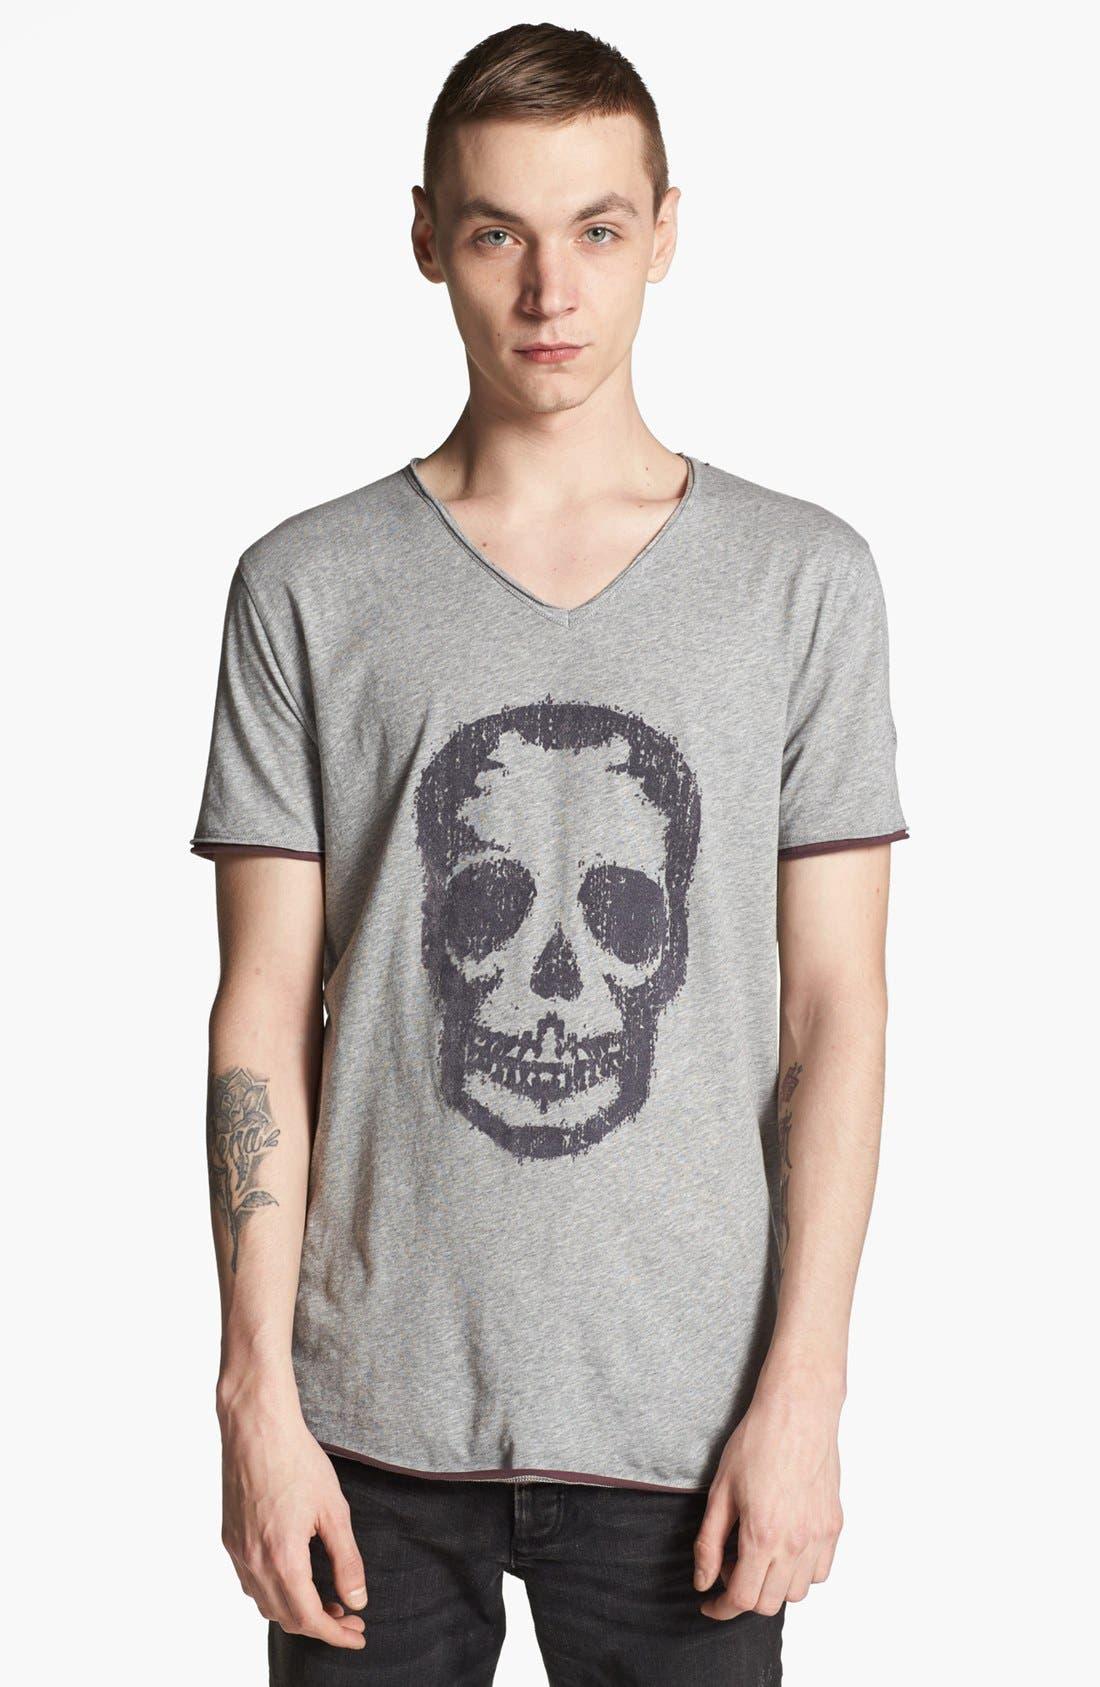 Alternate Image 1 Selected - Zadig & Voltaire 'Skull' V-Neck T-Shirt